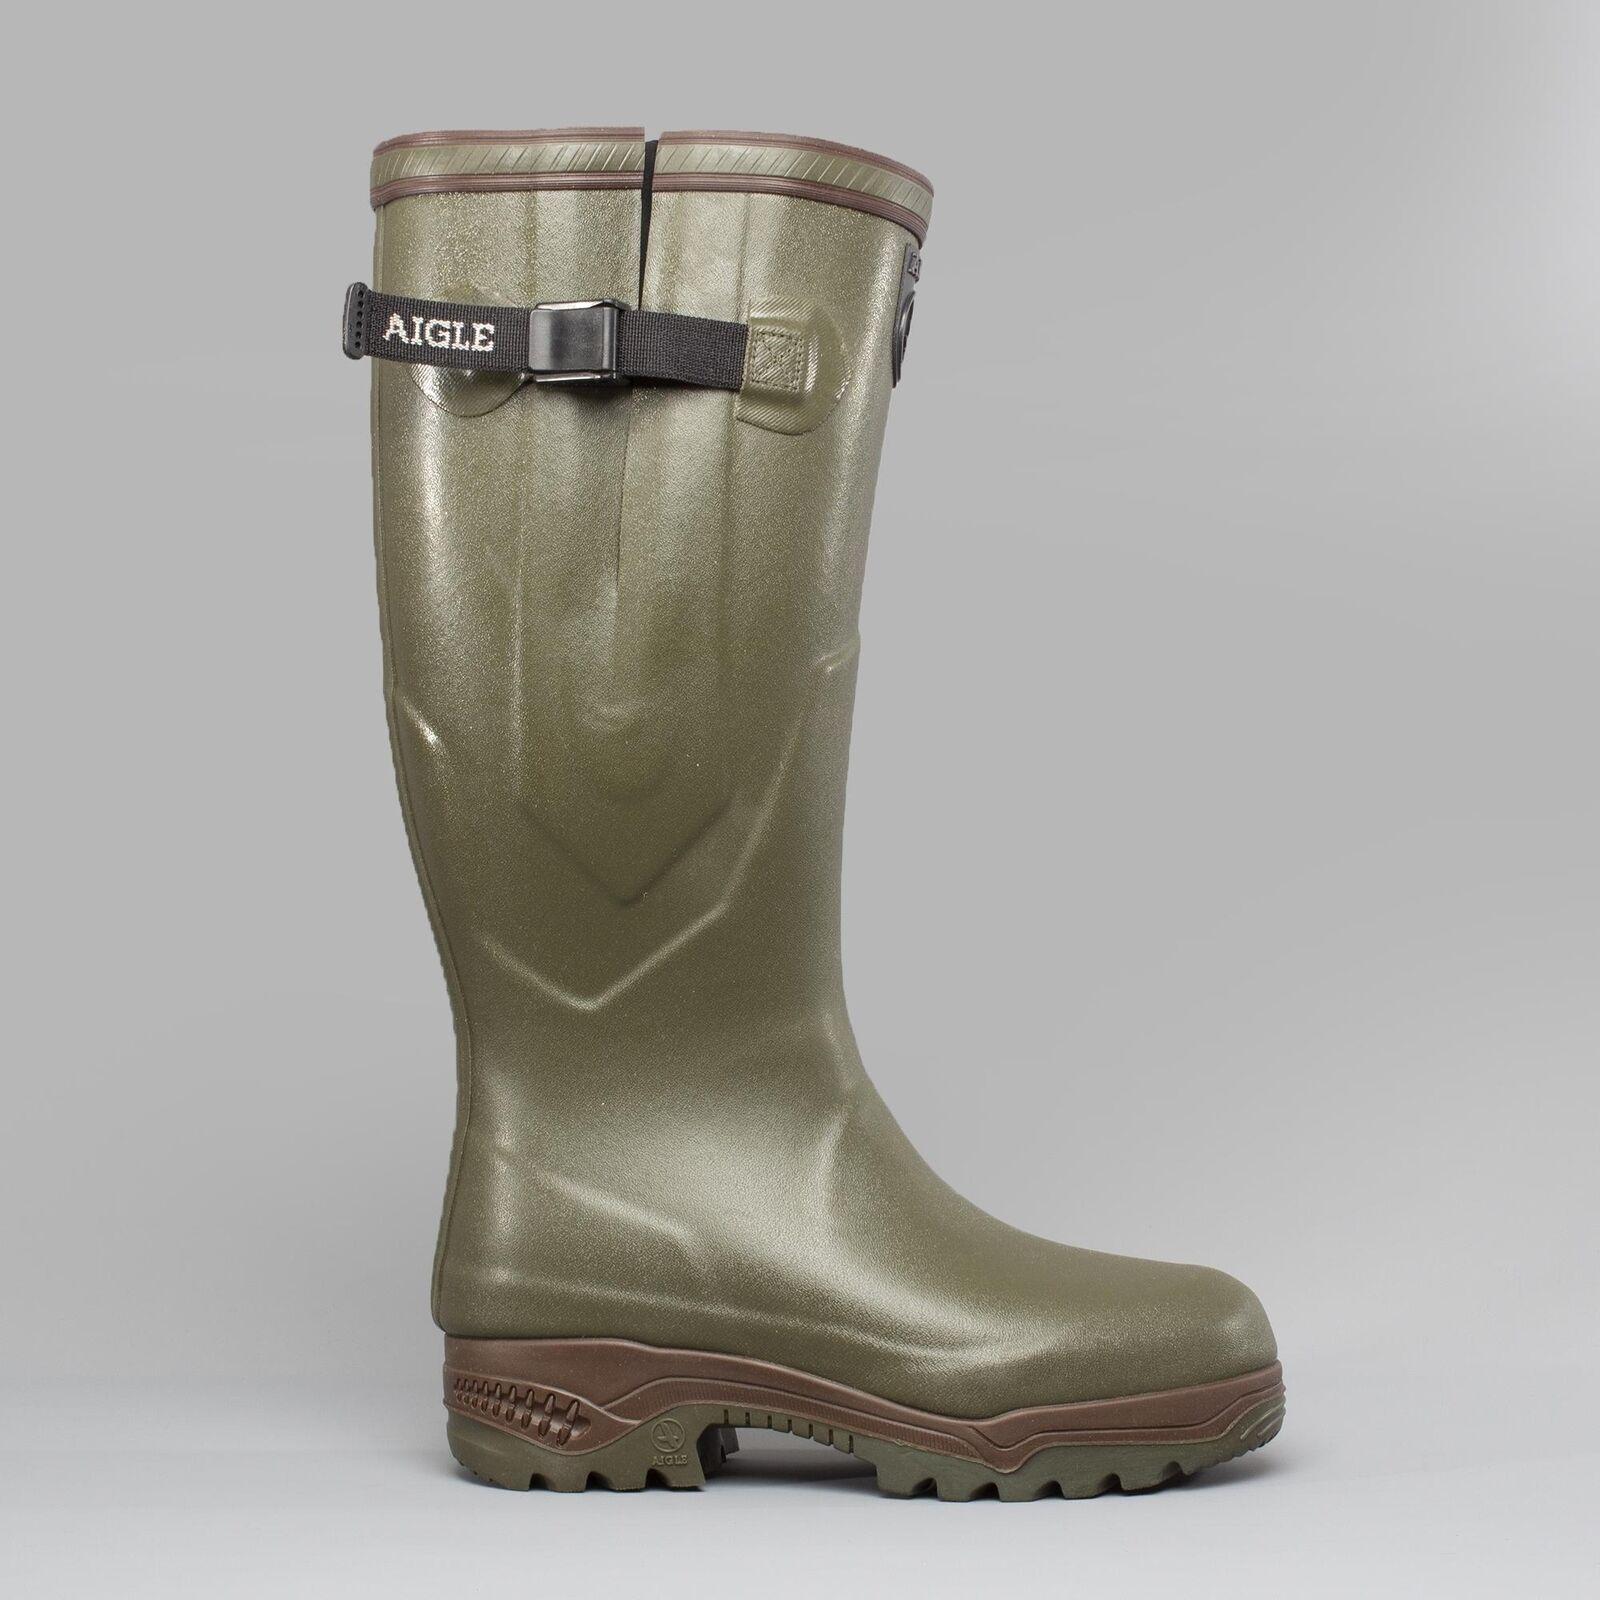 Aigle Parcours 2 ISO Unisex para Hombre Damas Hebilla Wellington botas Caqui Marrón